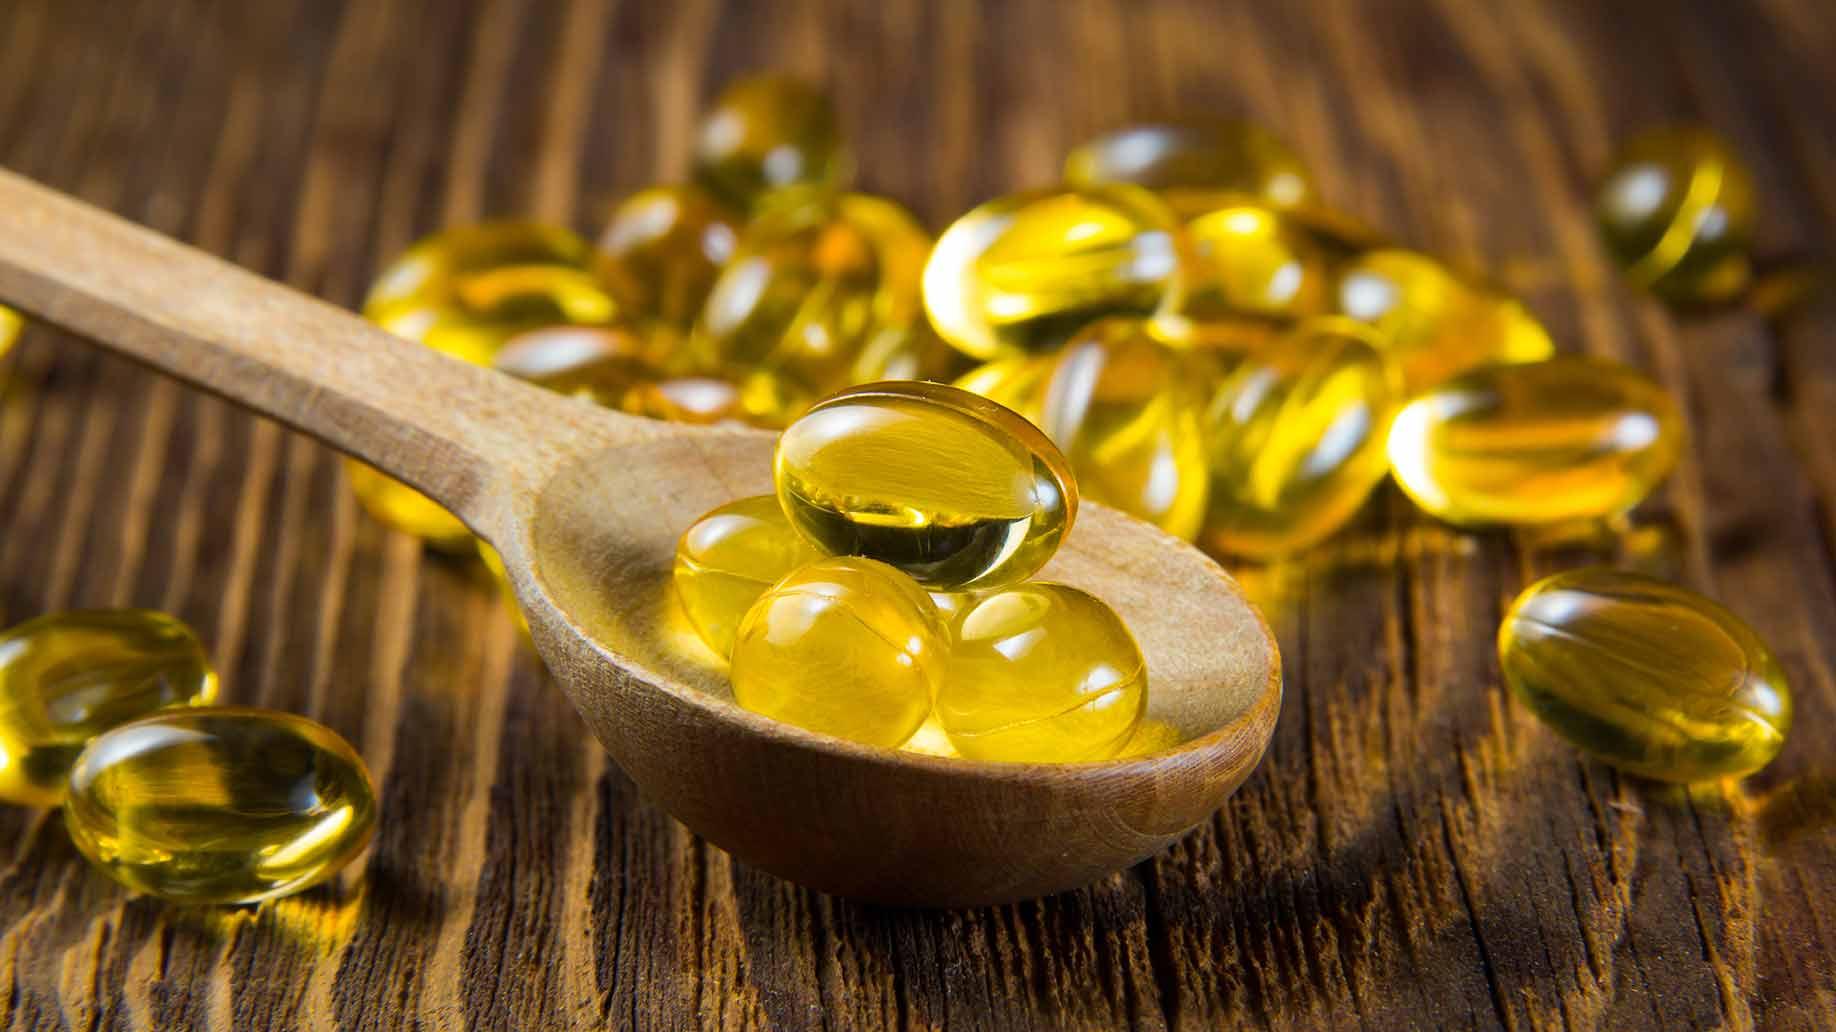 omega 3 fish oil fatty acids pills natural remedy high blood pressure hypertension